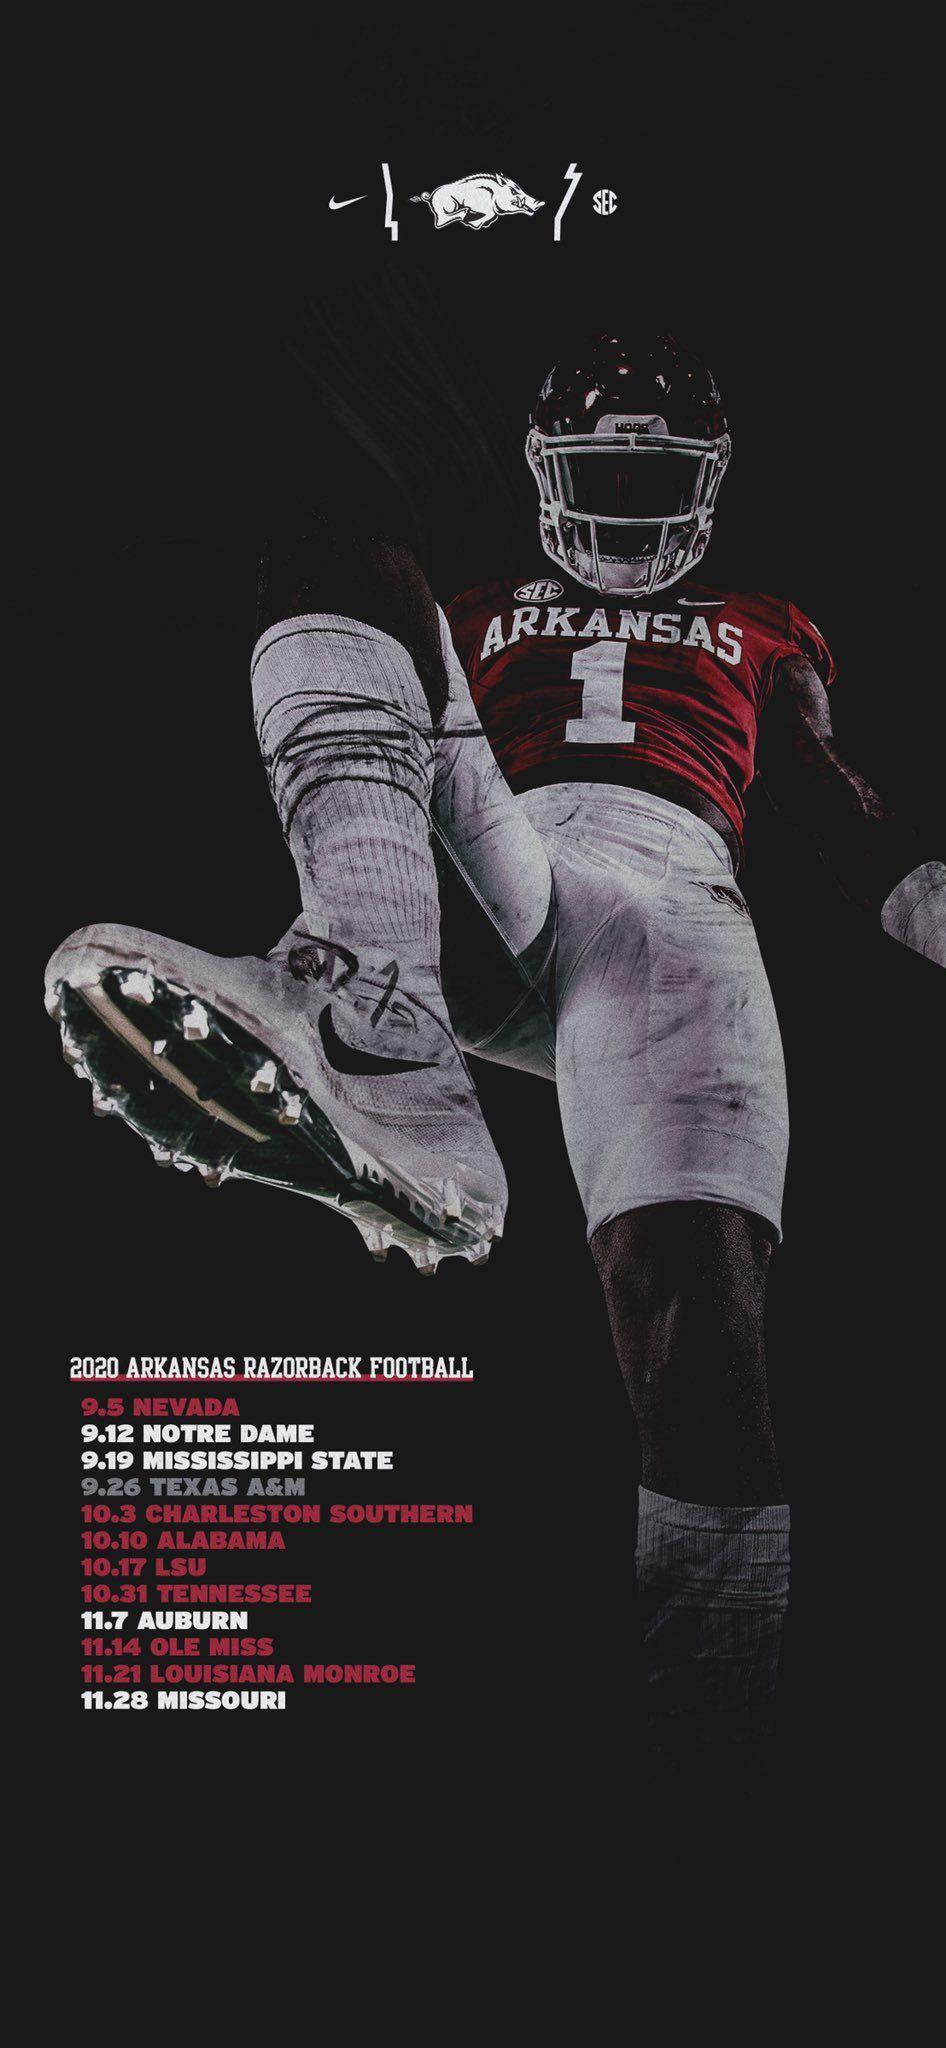 Arkansas In 2020 Arkansas Razorbacks Football Sports Graphic Design Arkansas